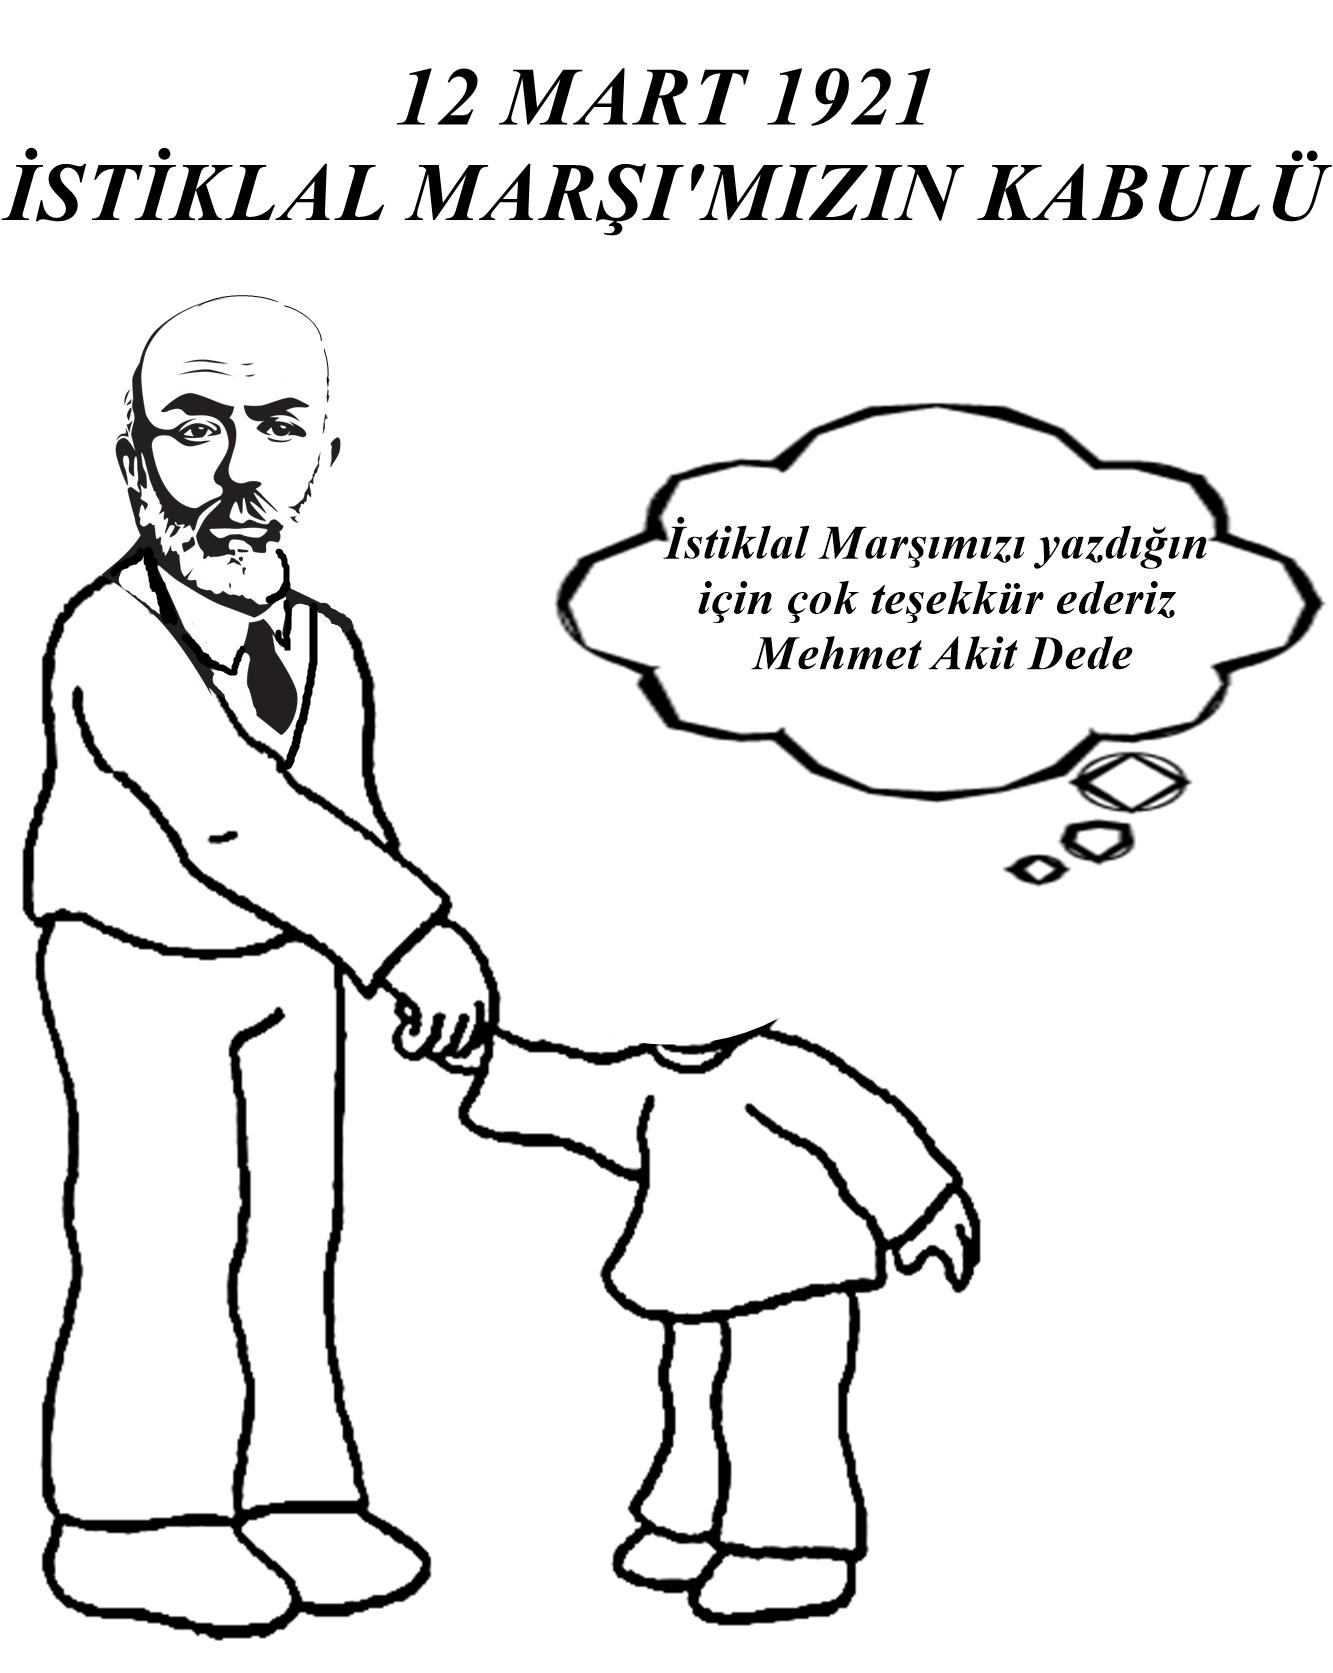 Istiklal Marsinin Kabulu 12 Mart 1921 Mehmet Akif Ersoy Boyama